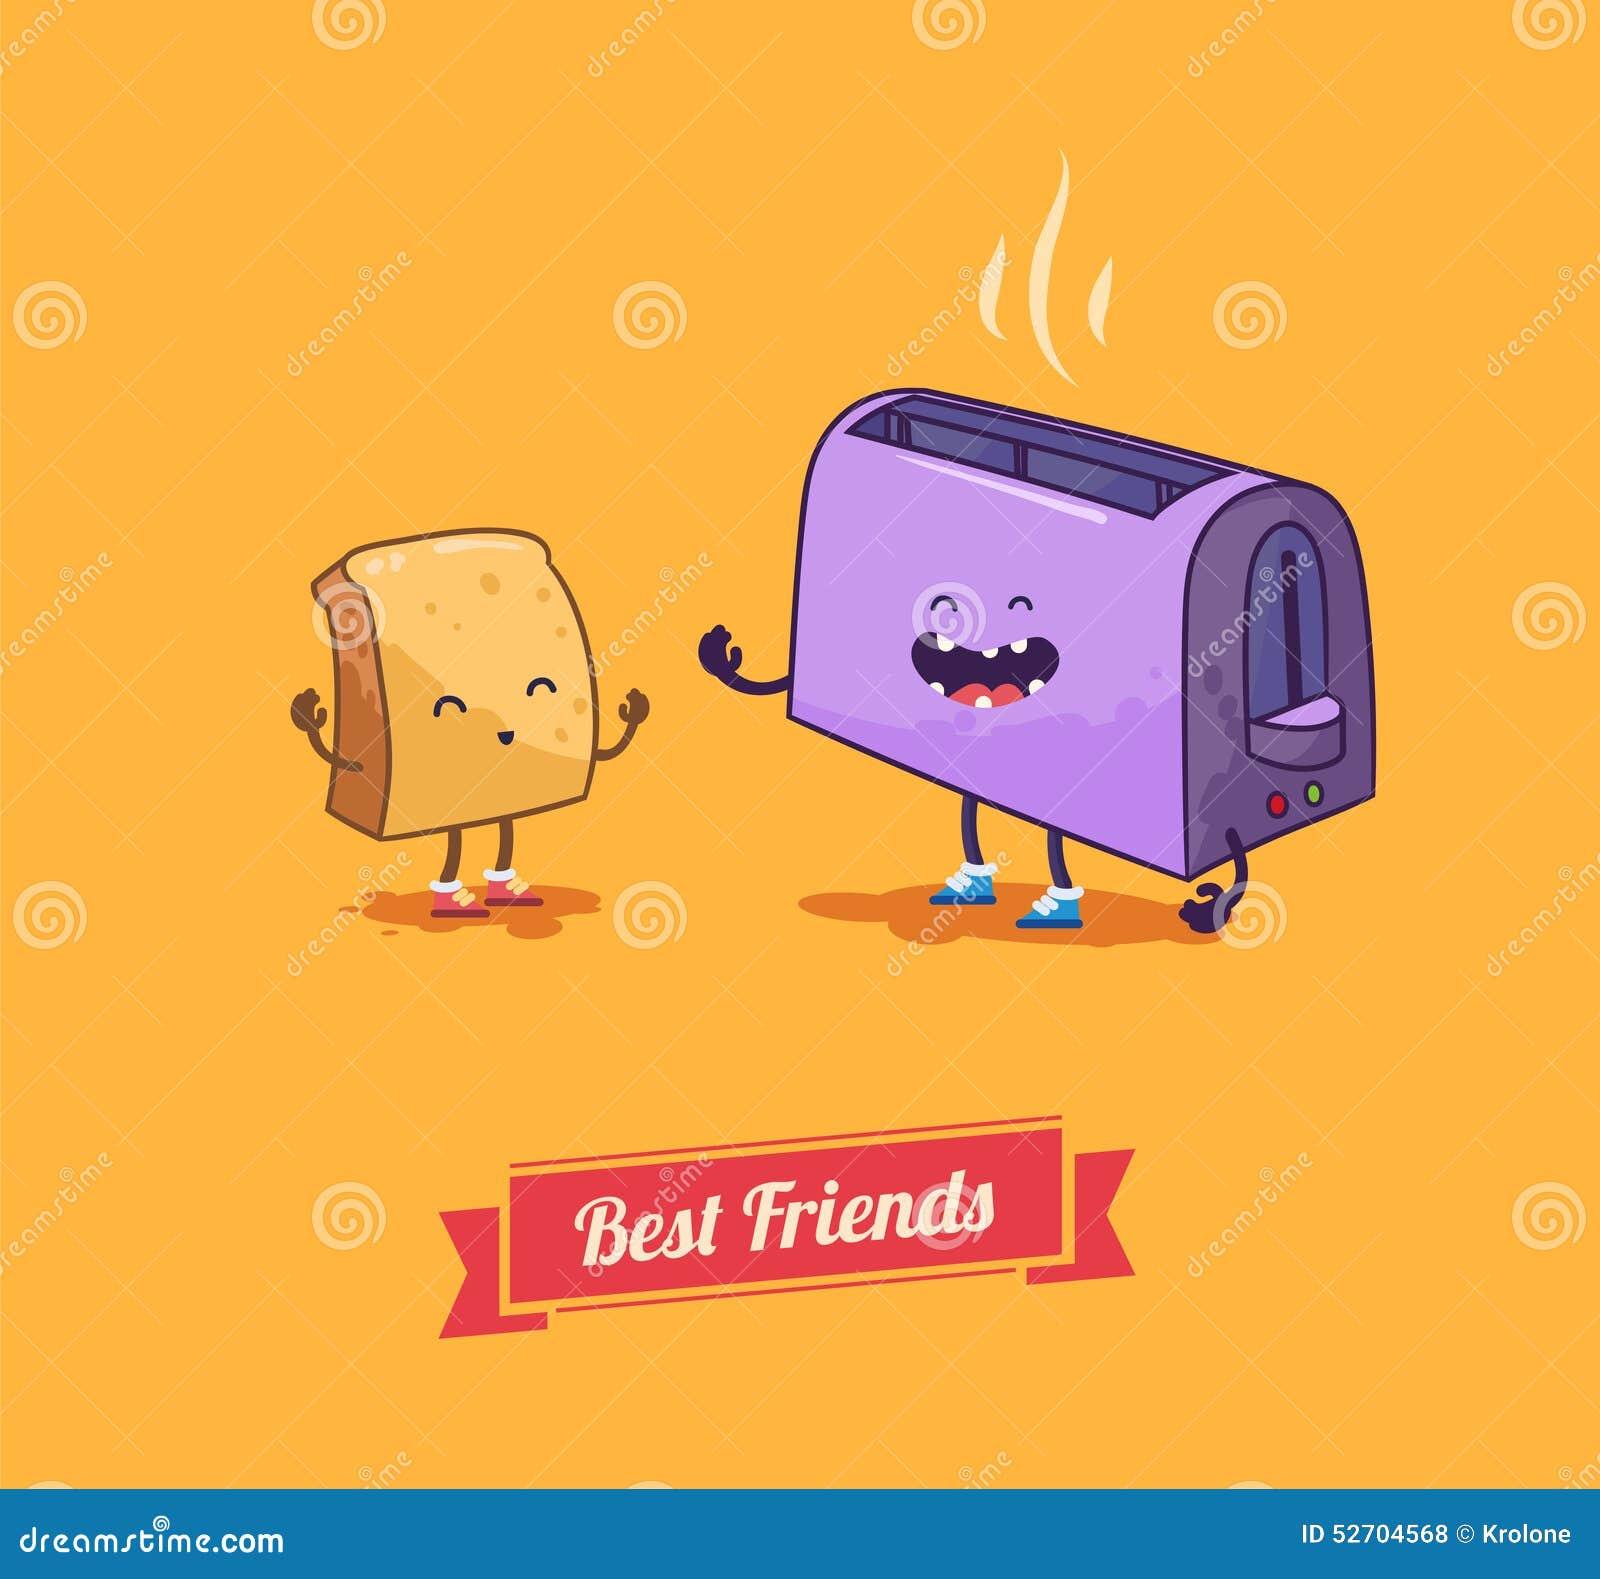 Best Friends Vector Cartoon Breakfast Stock Vector Illustration